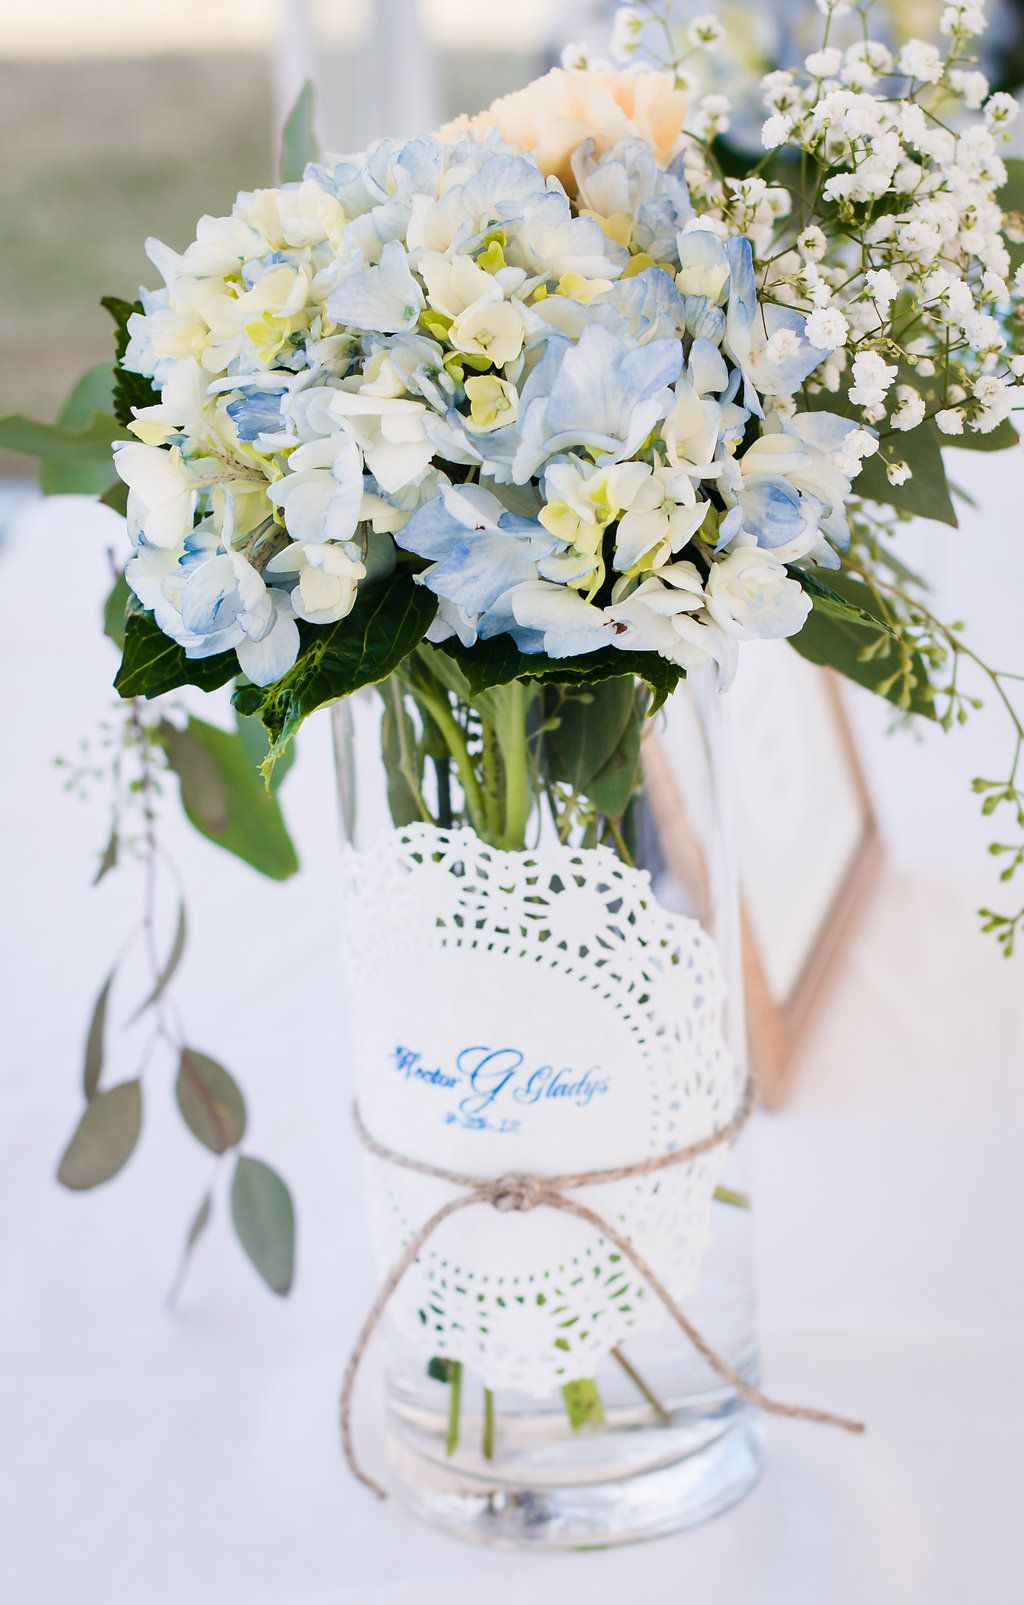 Baby Shower Flowers Its A Boy.. Blue Hydrangea, Peach Carnation, Seeded  Eucalyptus